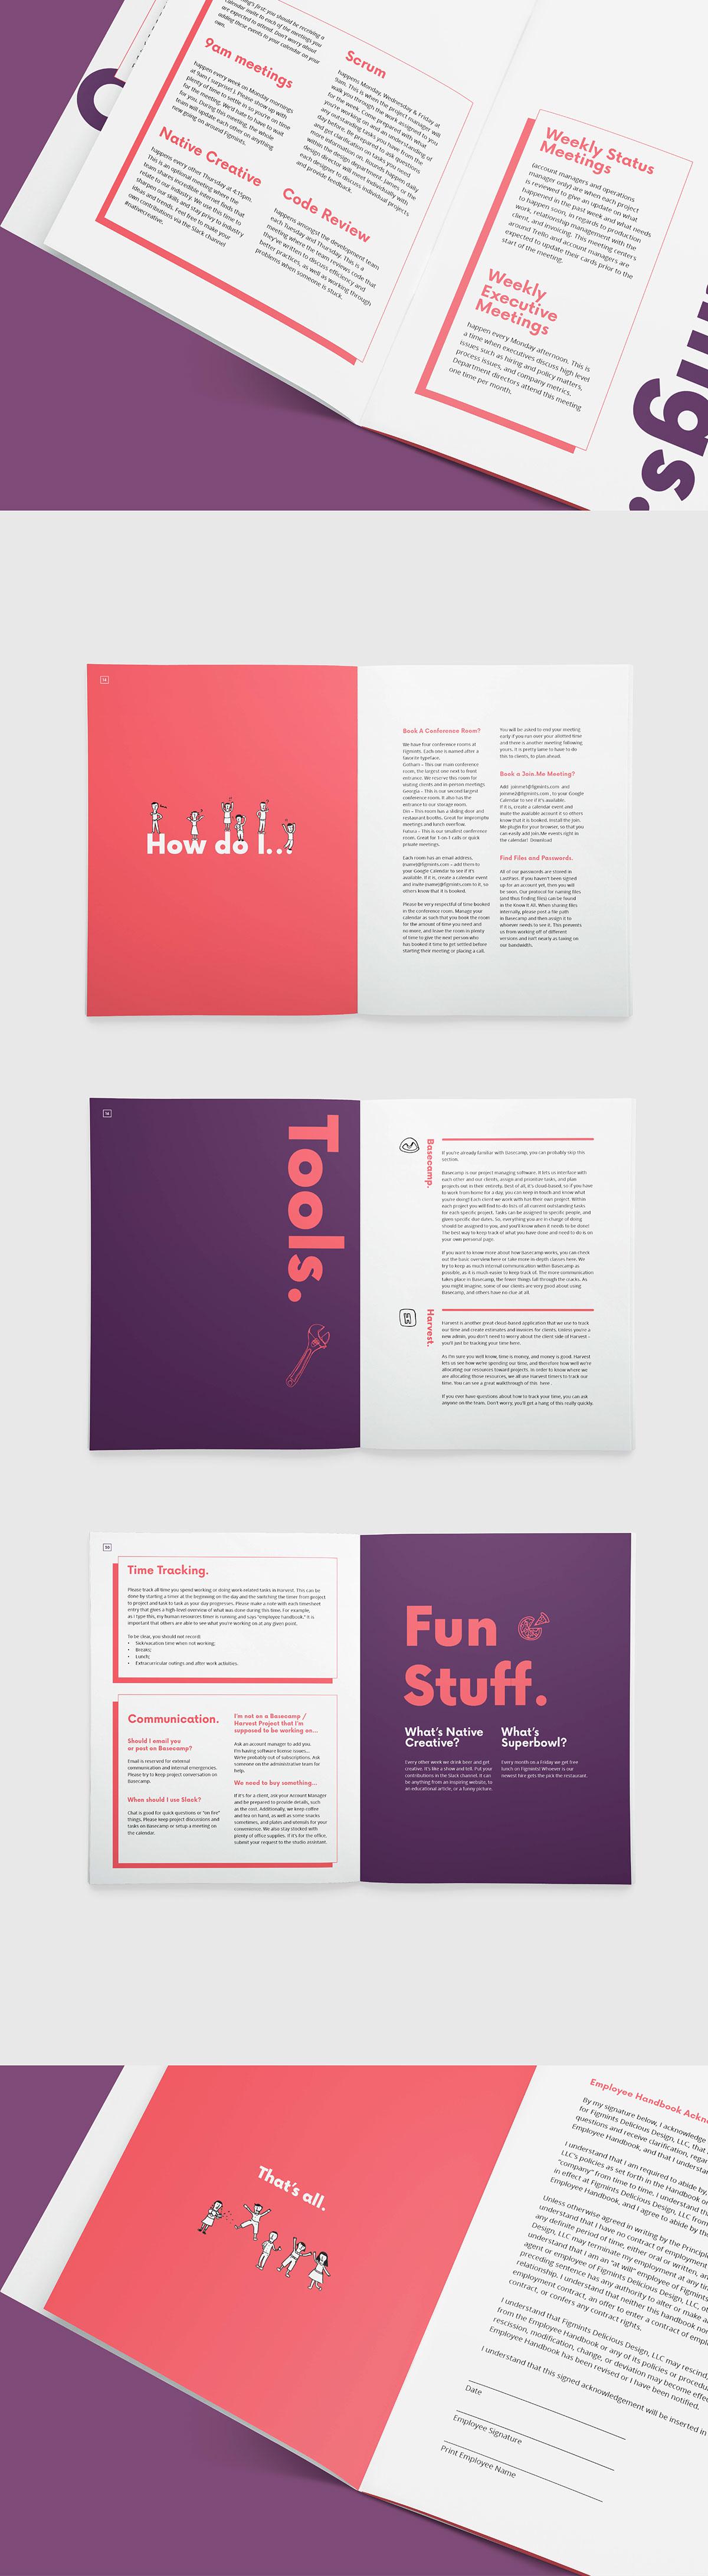 Figmints Employee Handbook On RISD Portfolios - Employee handbook design